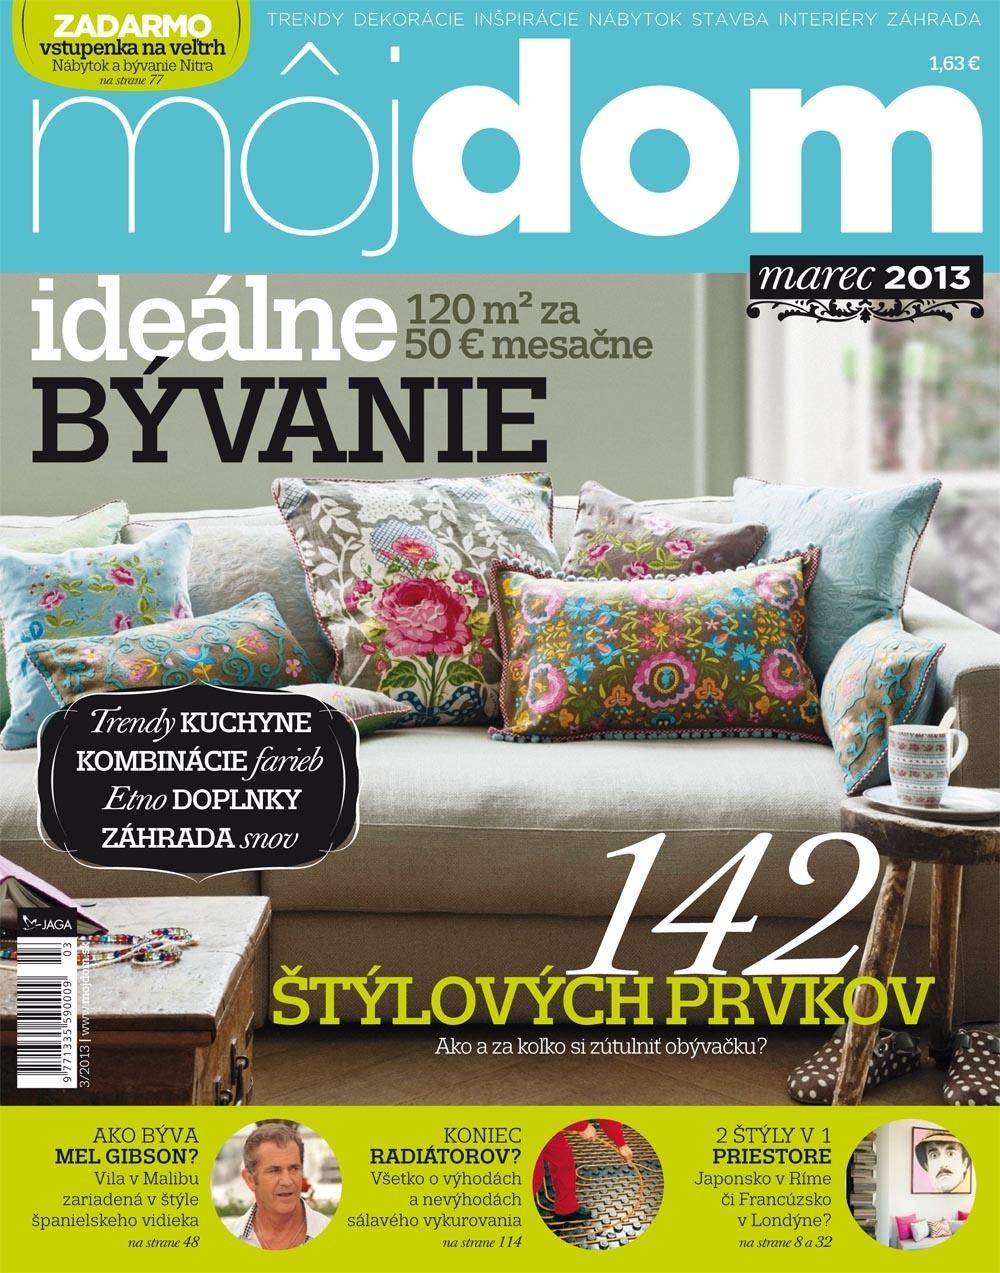 Časopis Môj dom marec 2013 už v predaji